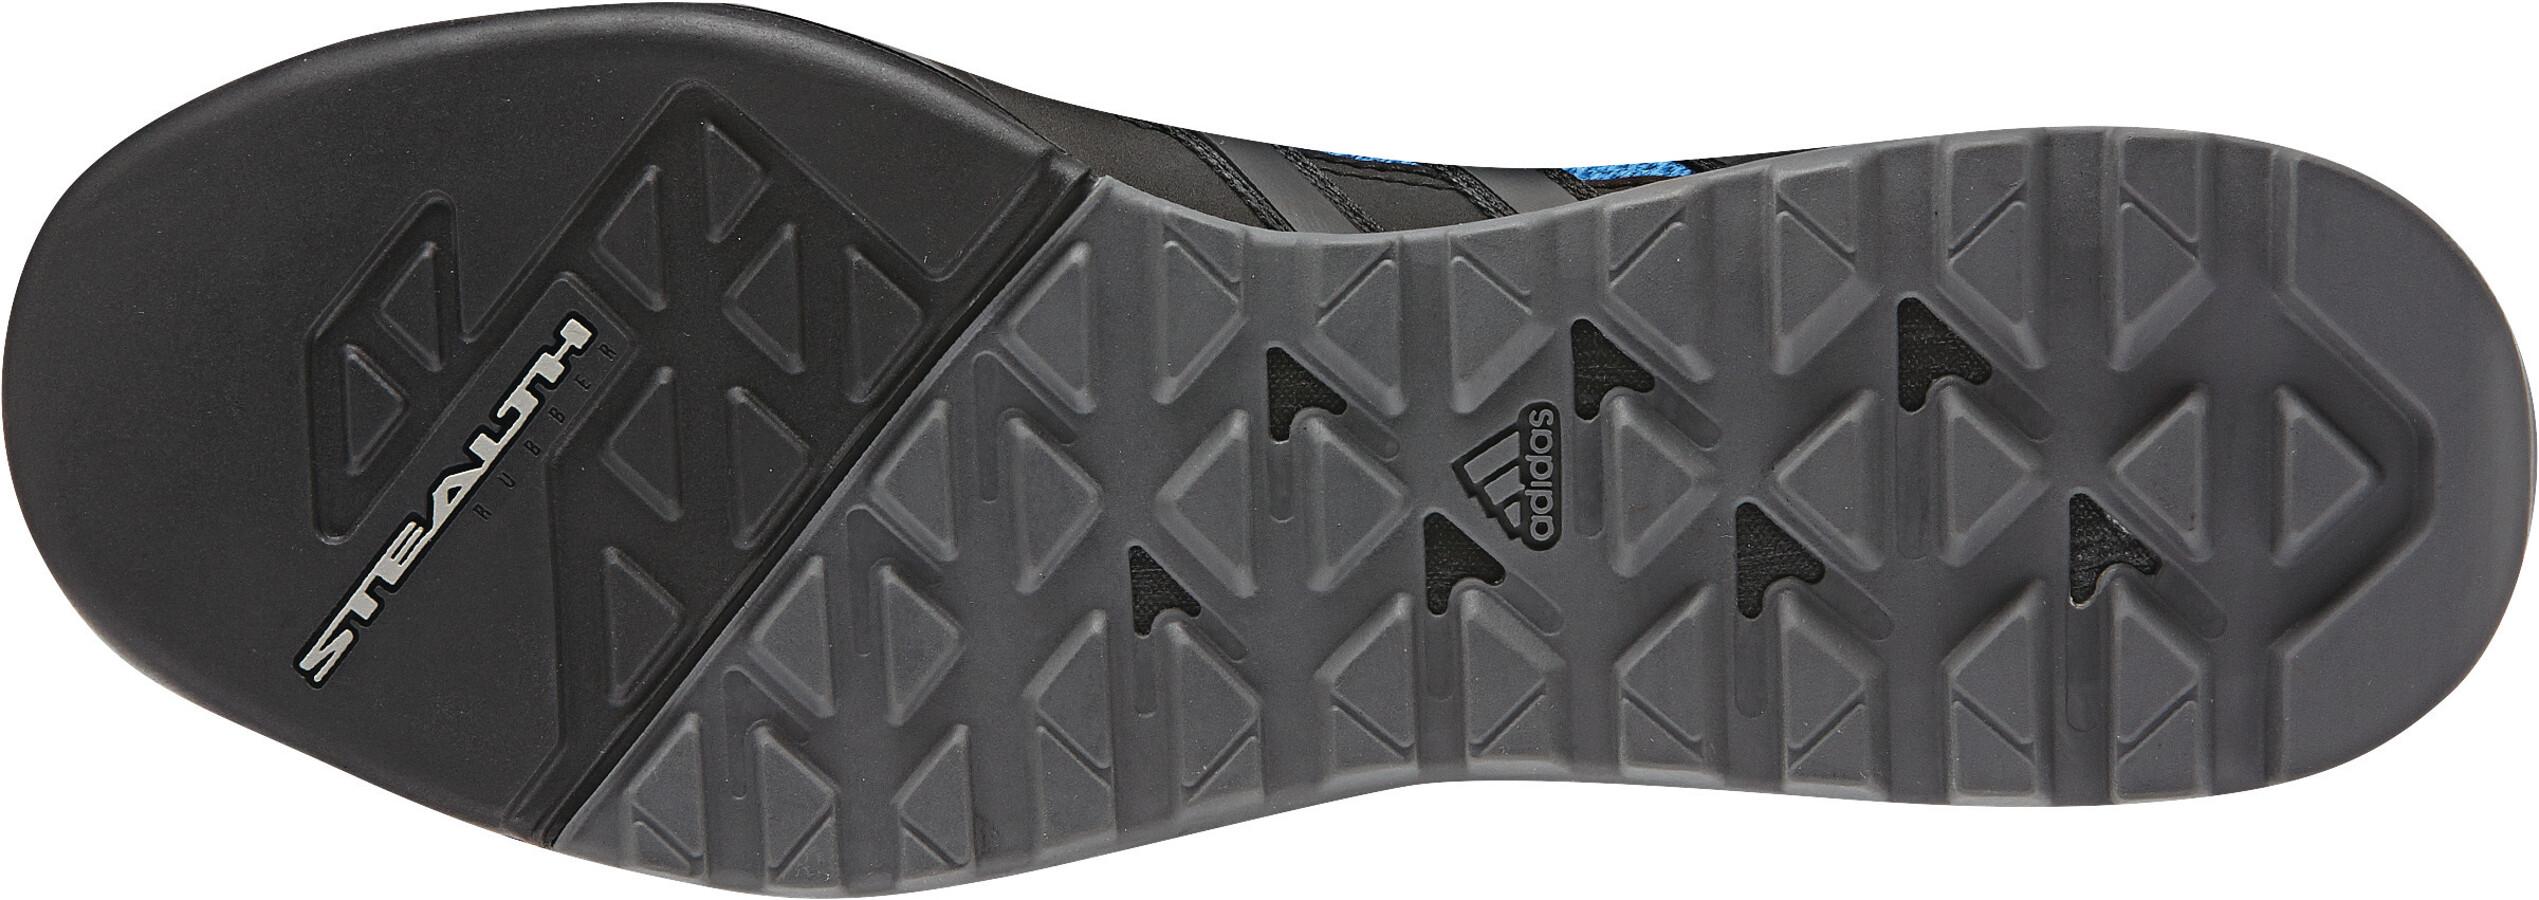 5ec9f4ca4 adidas TERREX Solo Shoes Men black/turquoise at Bikester.co.uk